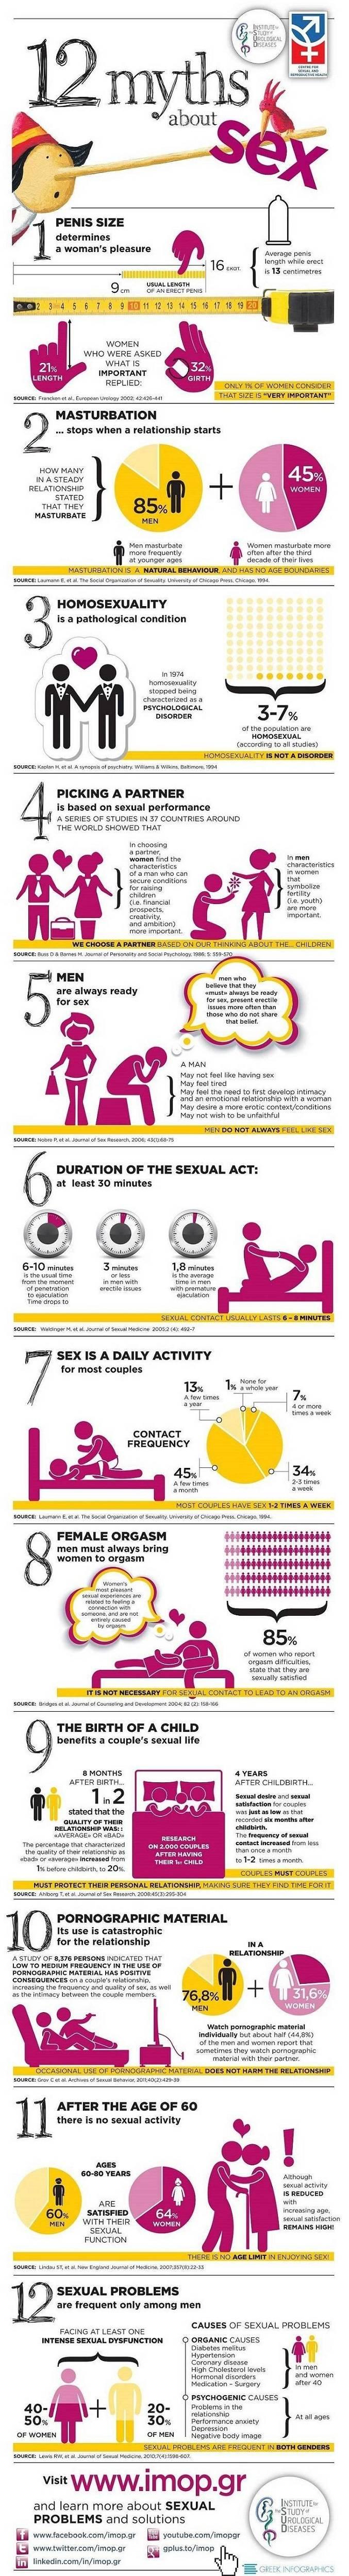 myths about sex info